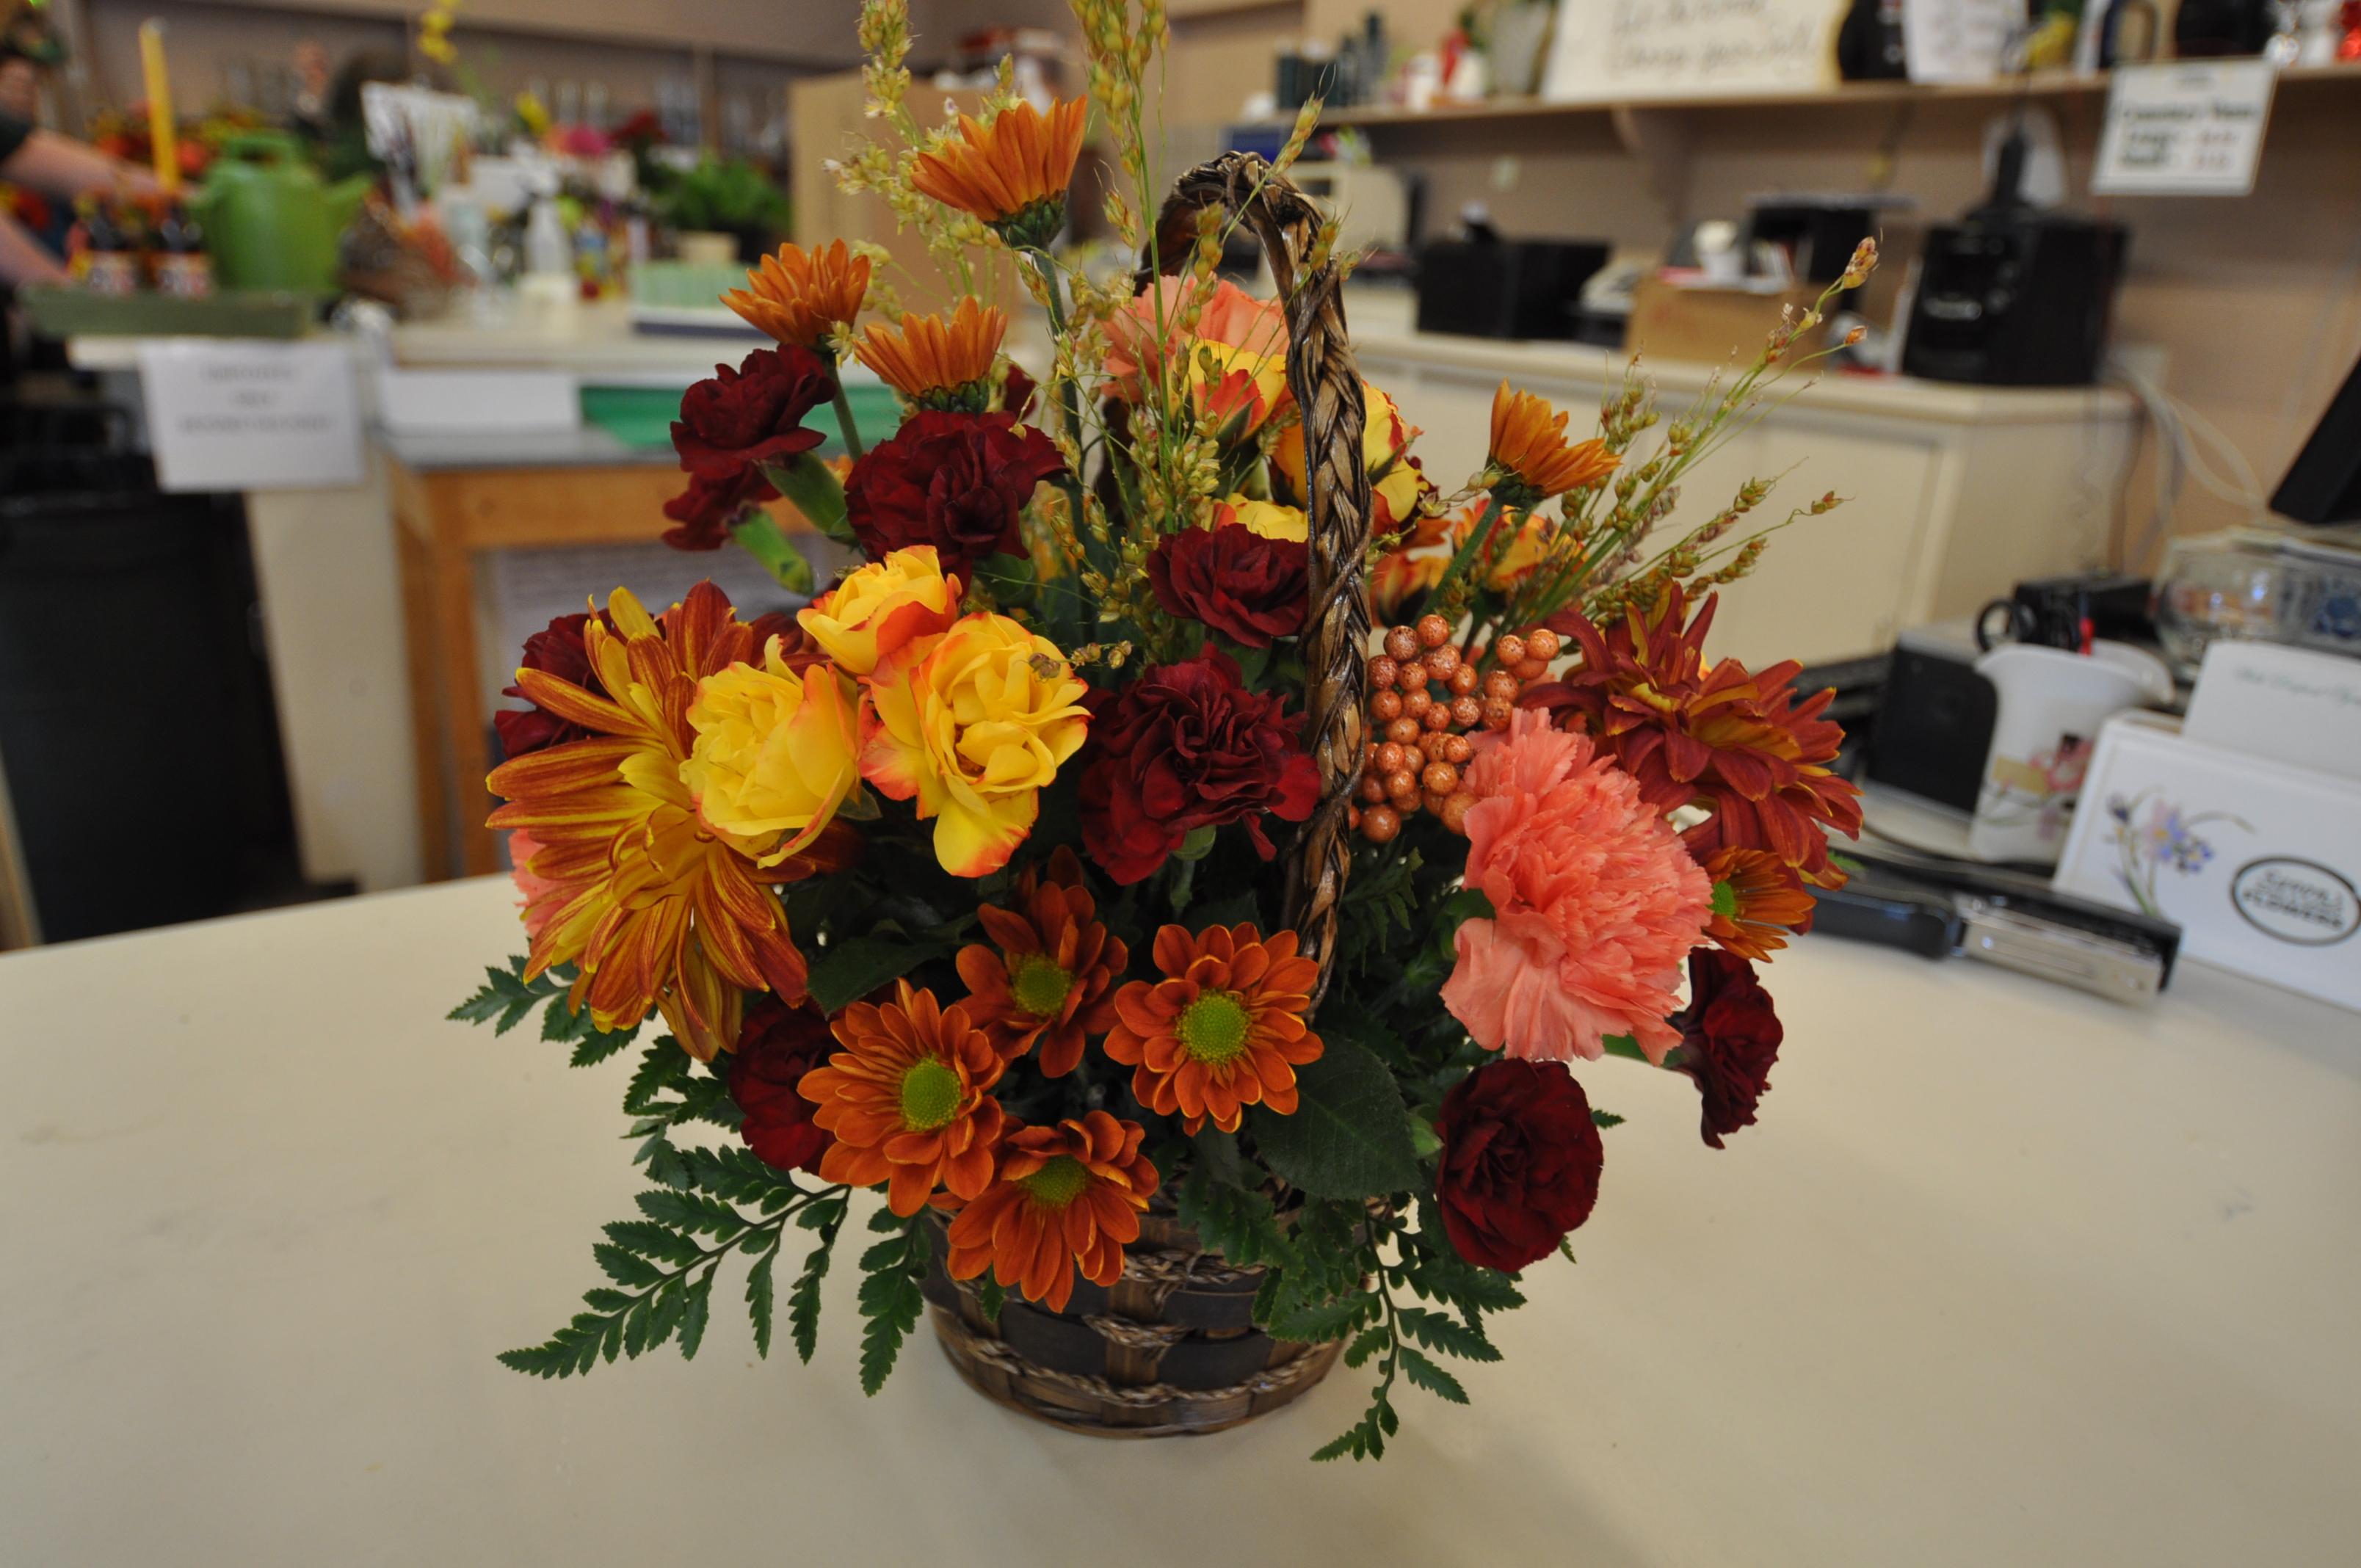 Shannon Loves Flowers - Albuquerque, NM